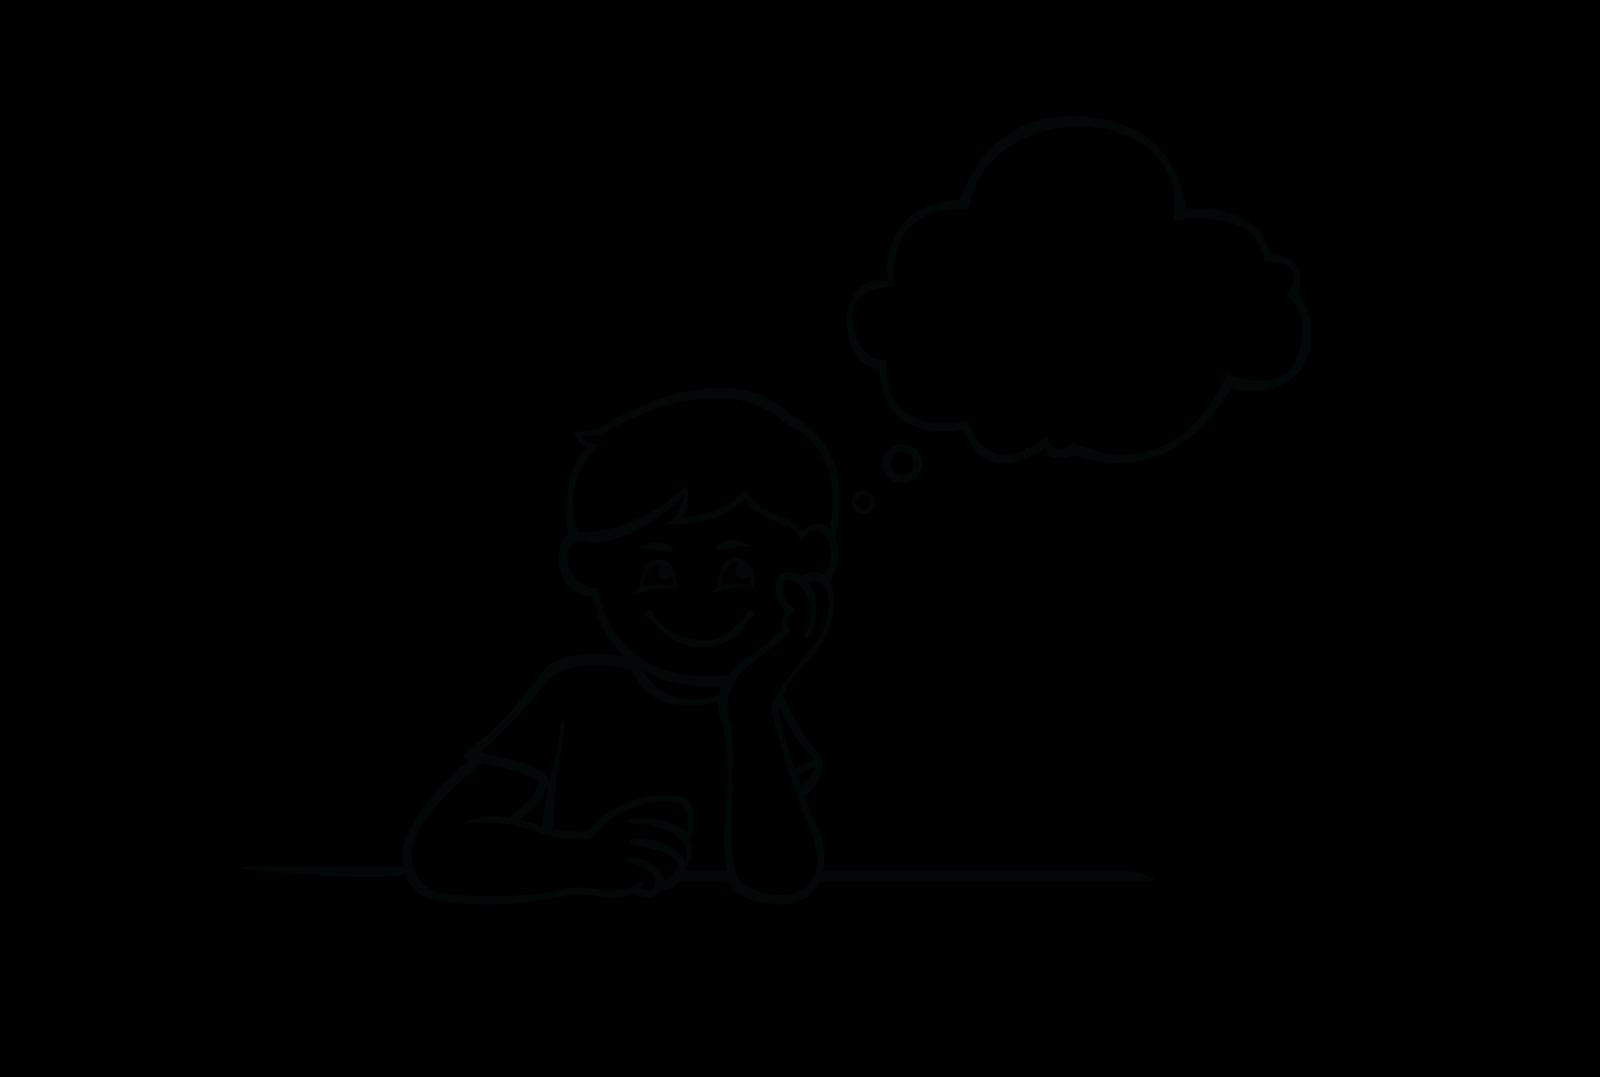 Cartoon Girl Daydreaming Vector & Photo | Bigstock |Daydreaming Cartoon